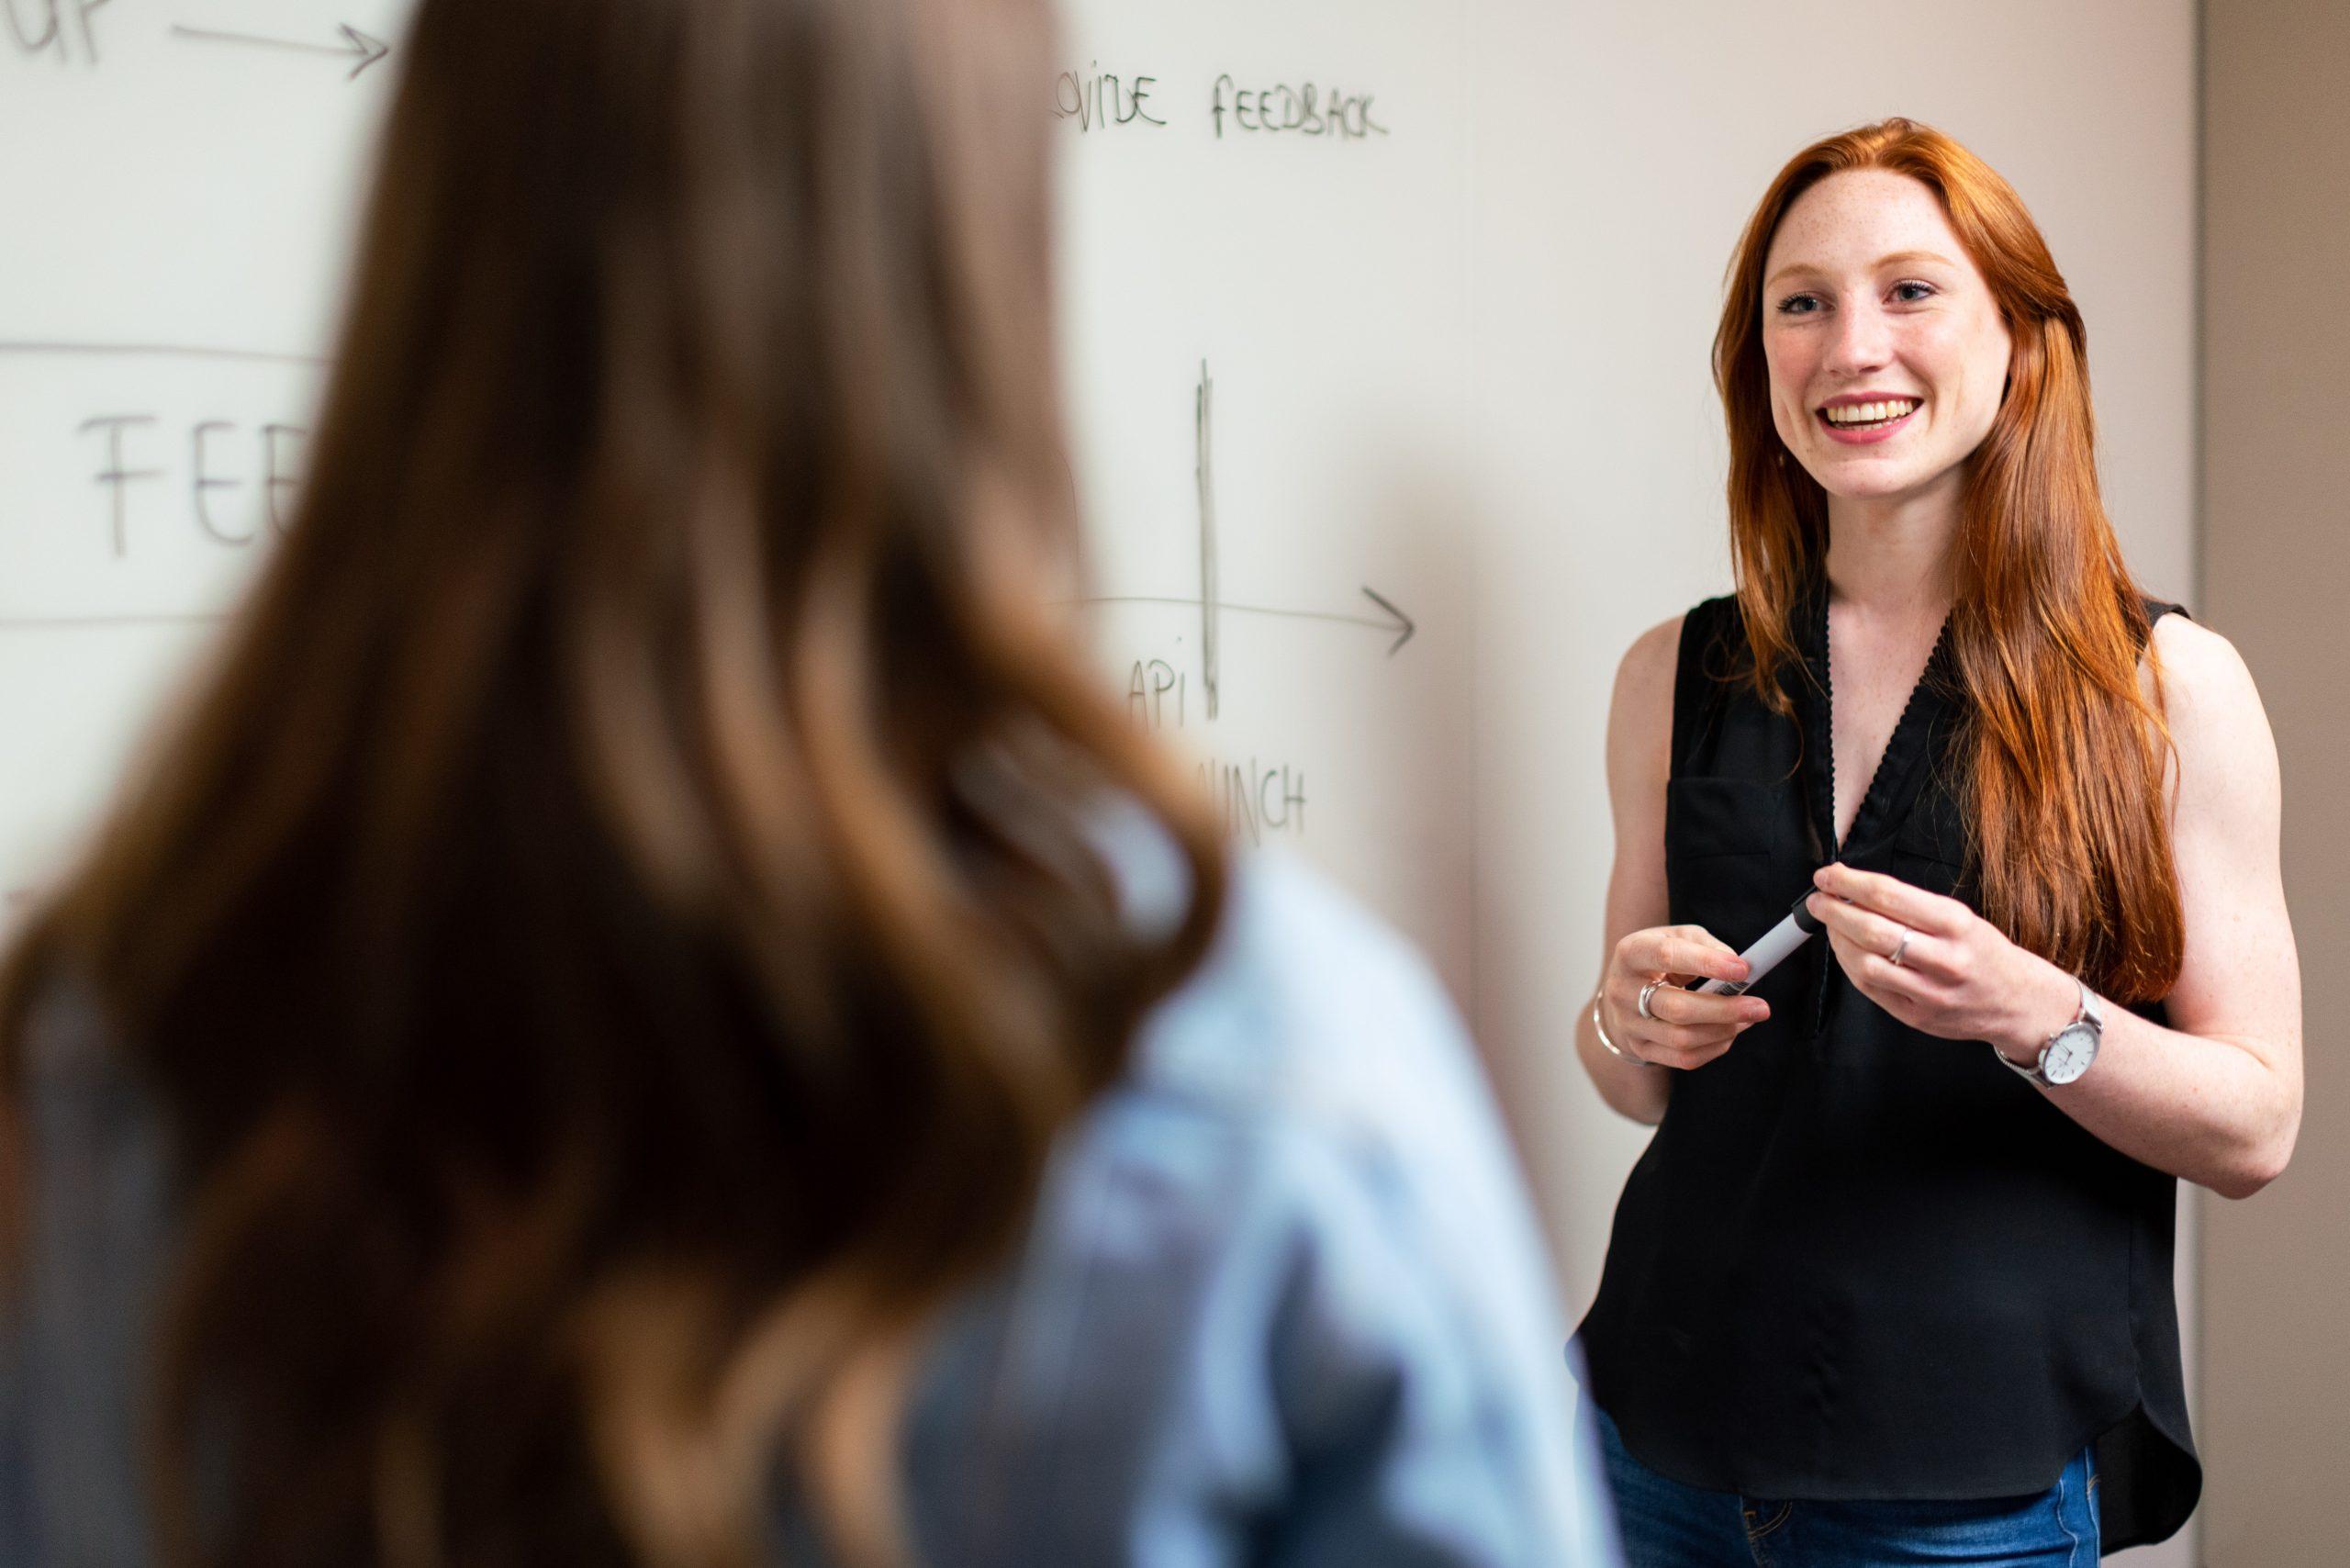 two women next to a whiteboard